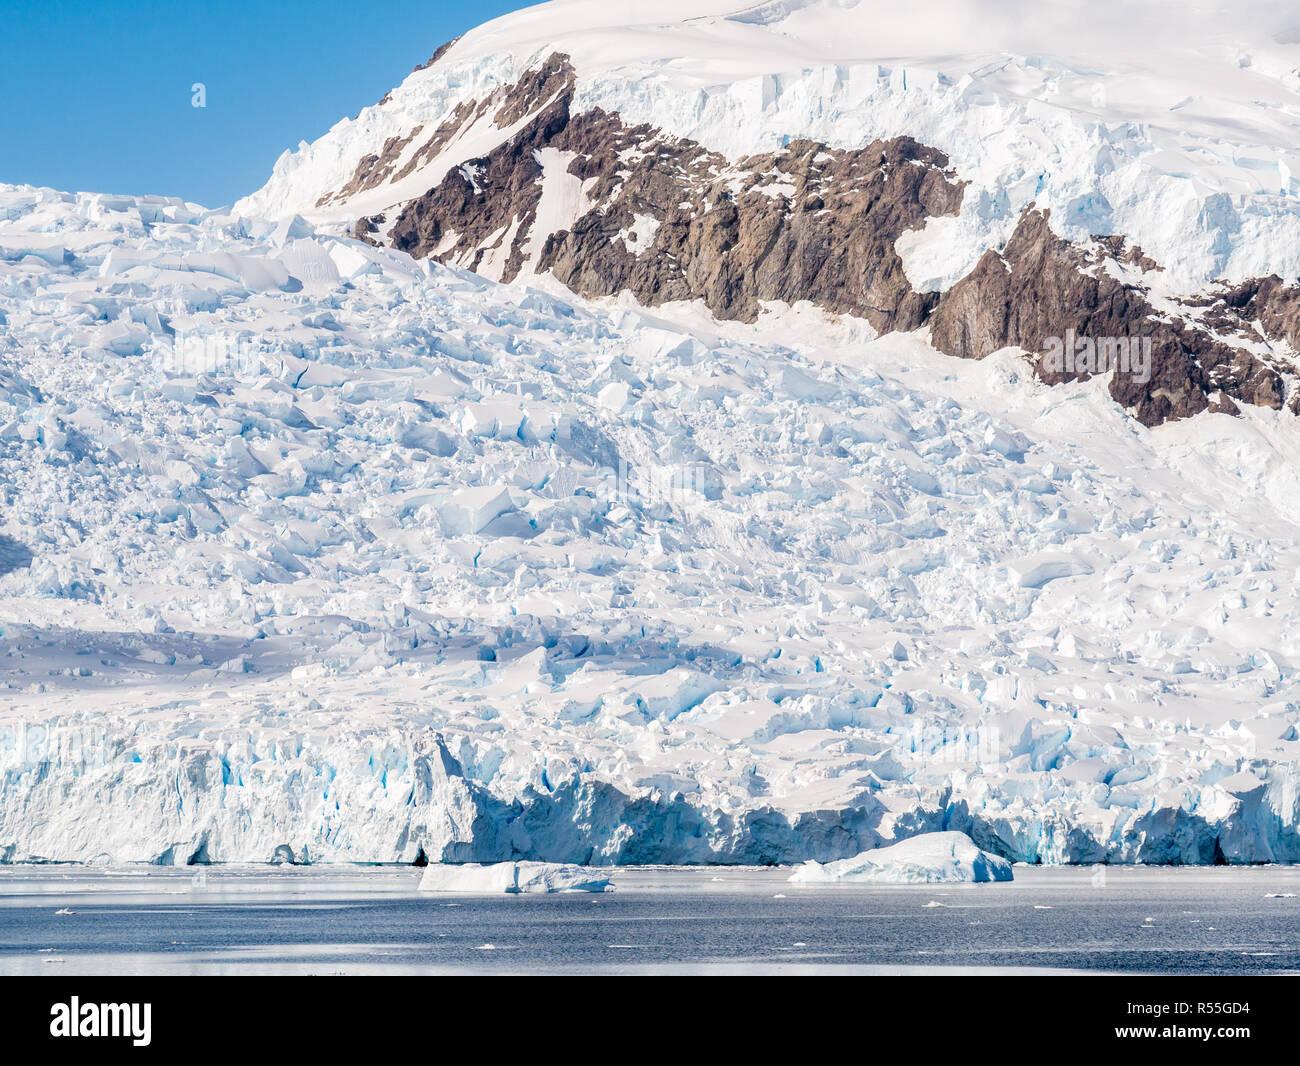 Deville glacier calving in Andvord Bay near Neko Harbour, Arctowski Peninsula, Antarctica - Stock Image